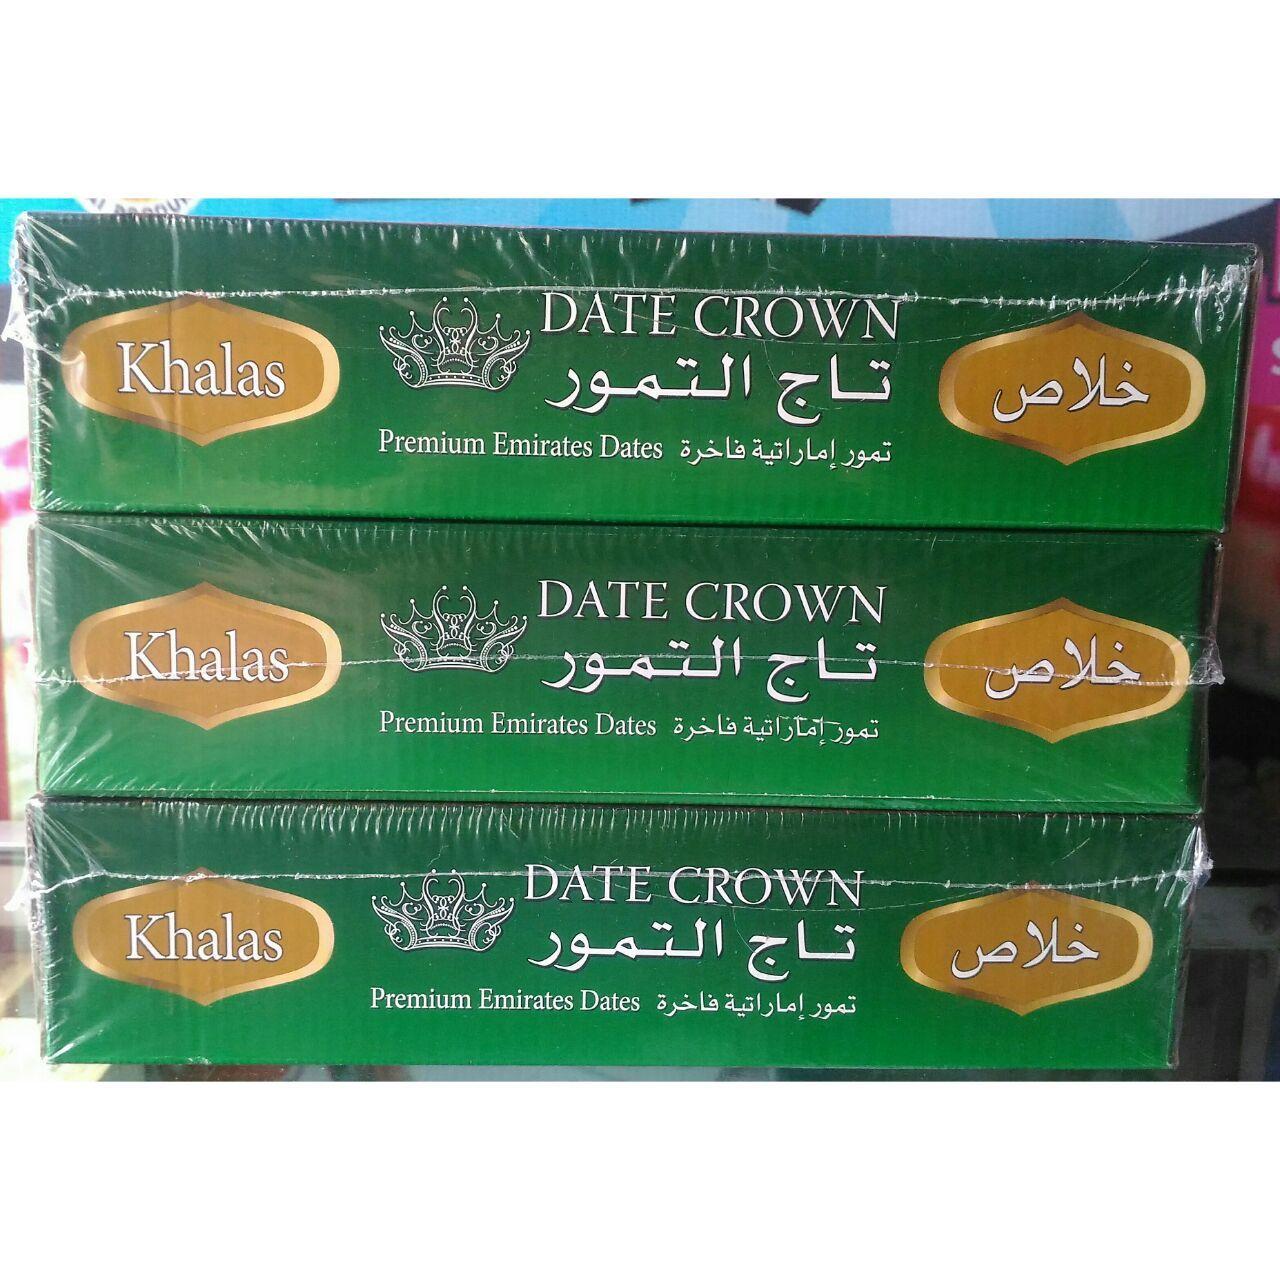 Kurma Khalas Date Crown 1kg Produk Terbaik Wiki Harga Hikmah 3